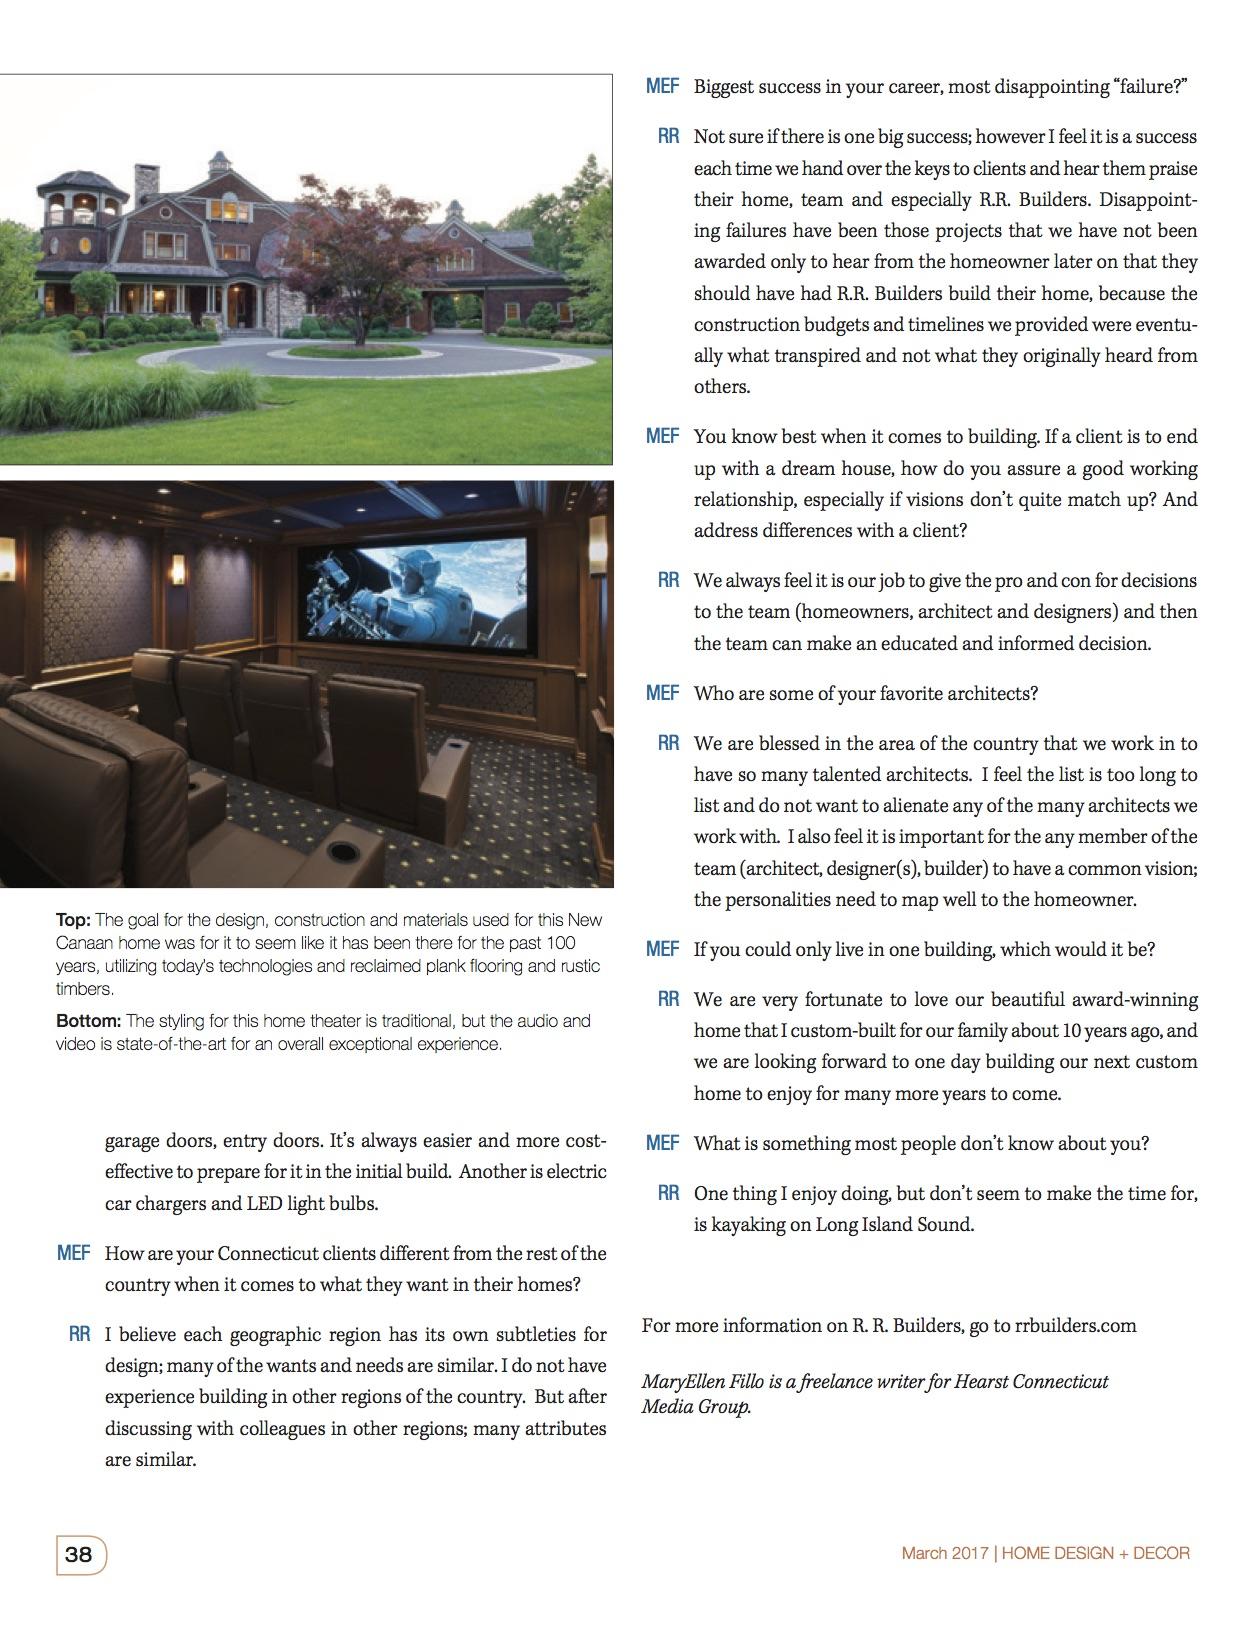 2017 Hearst CT Home Design magazine 38.jpg